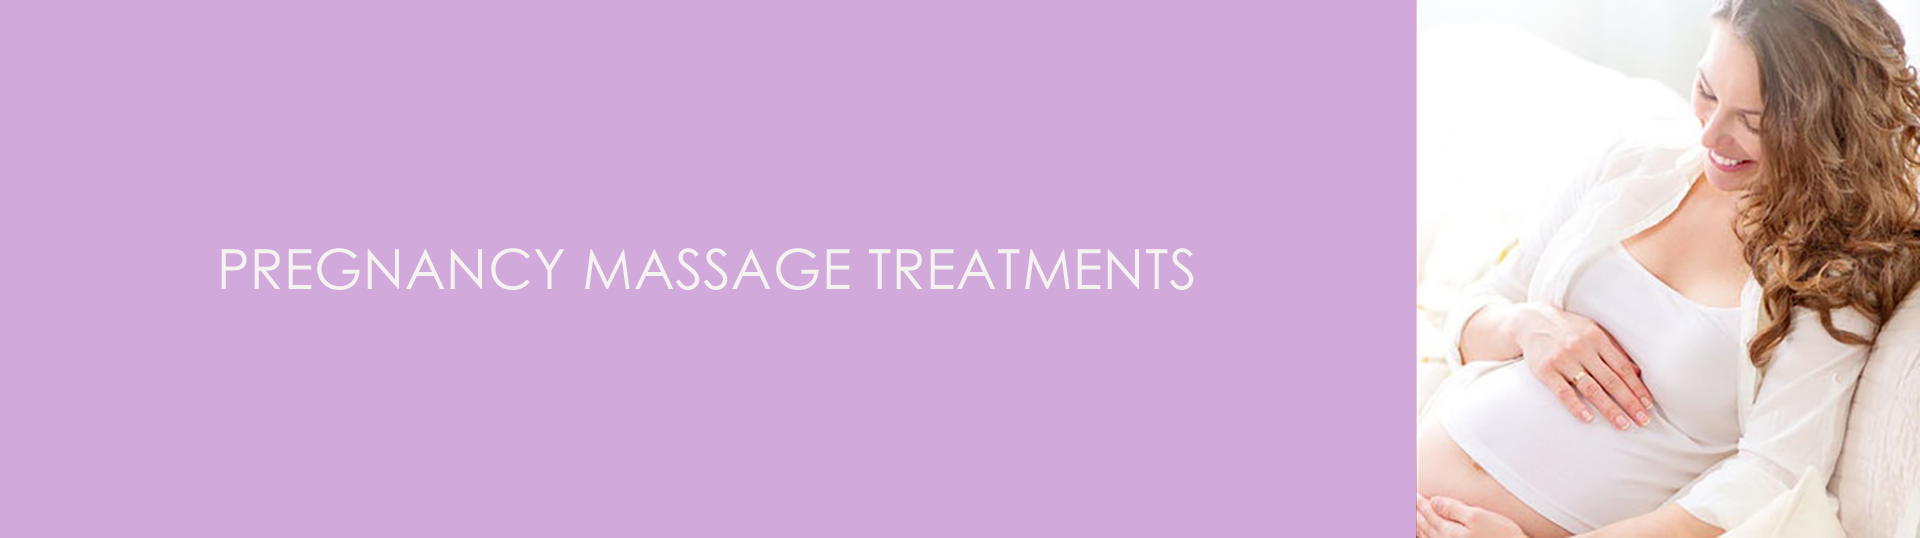 Pregnancy Massage Treatments